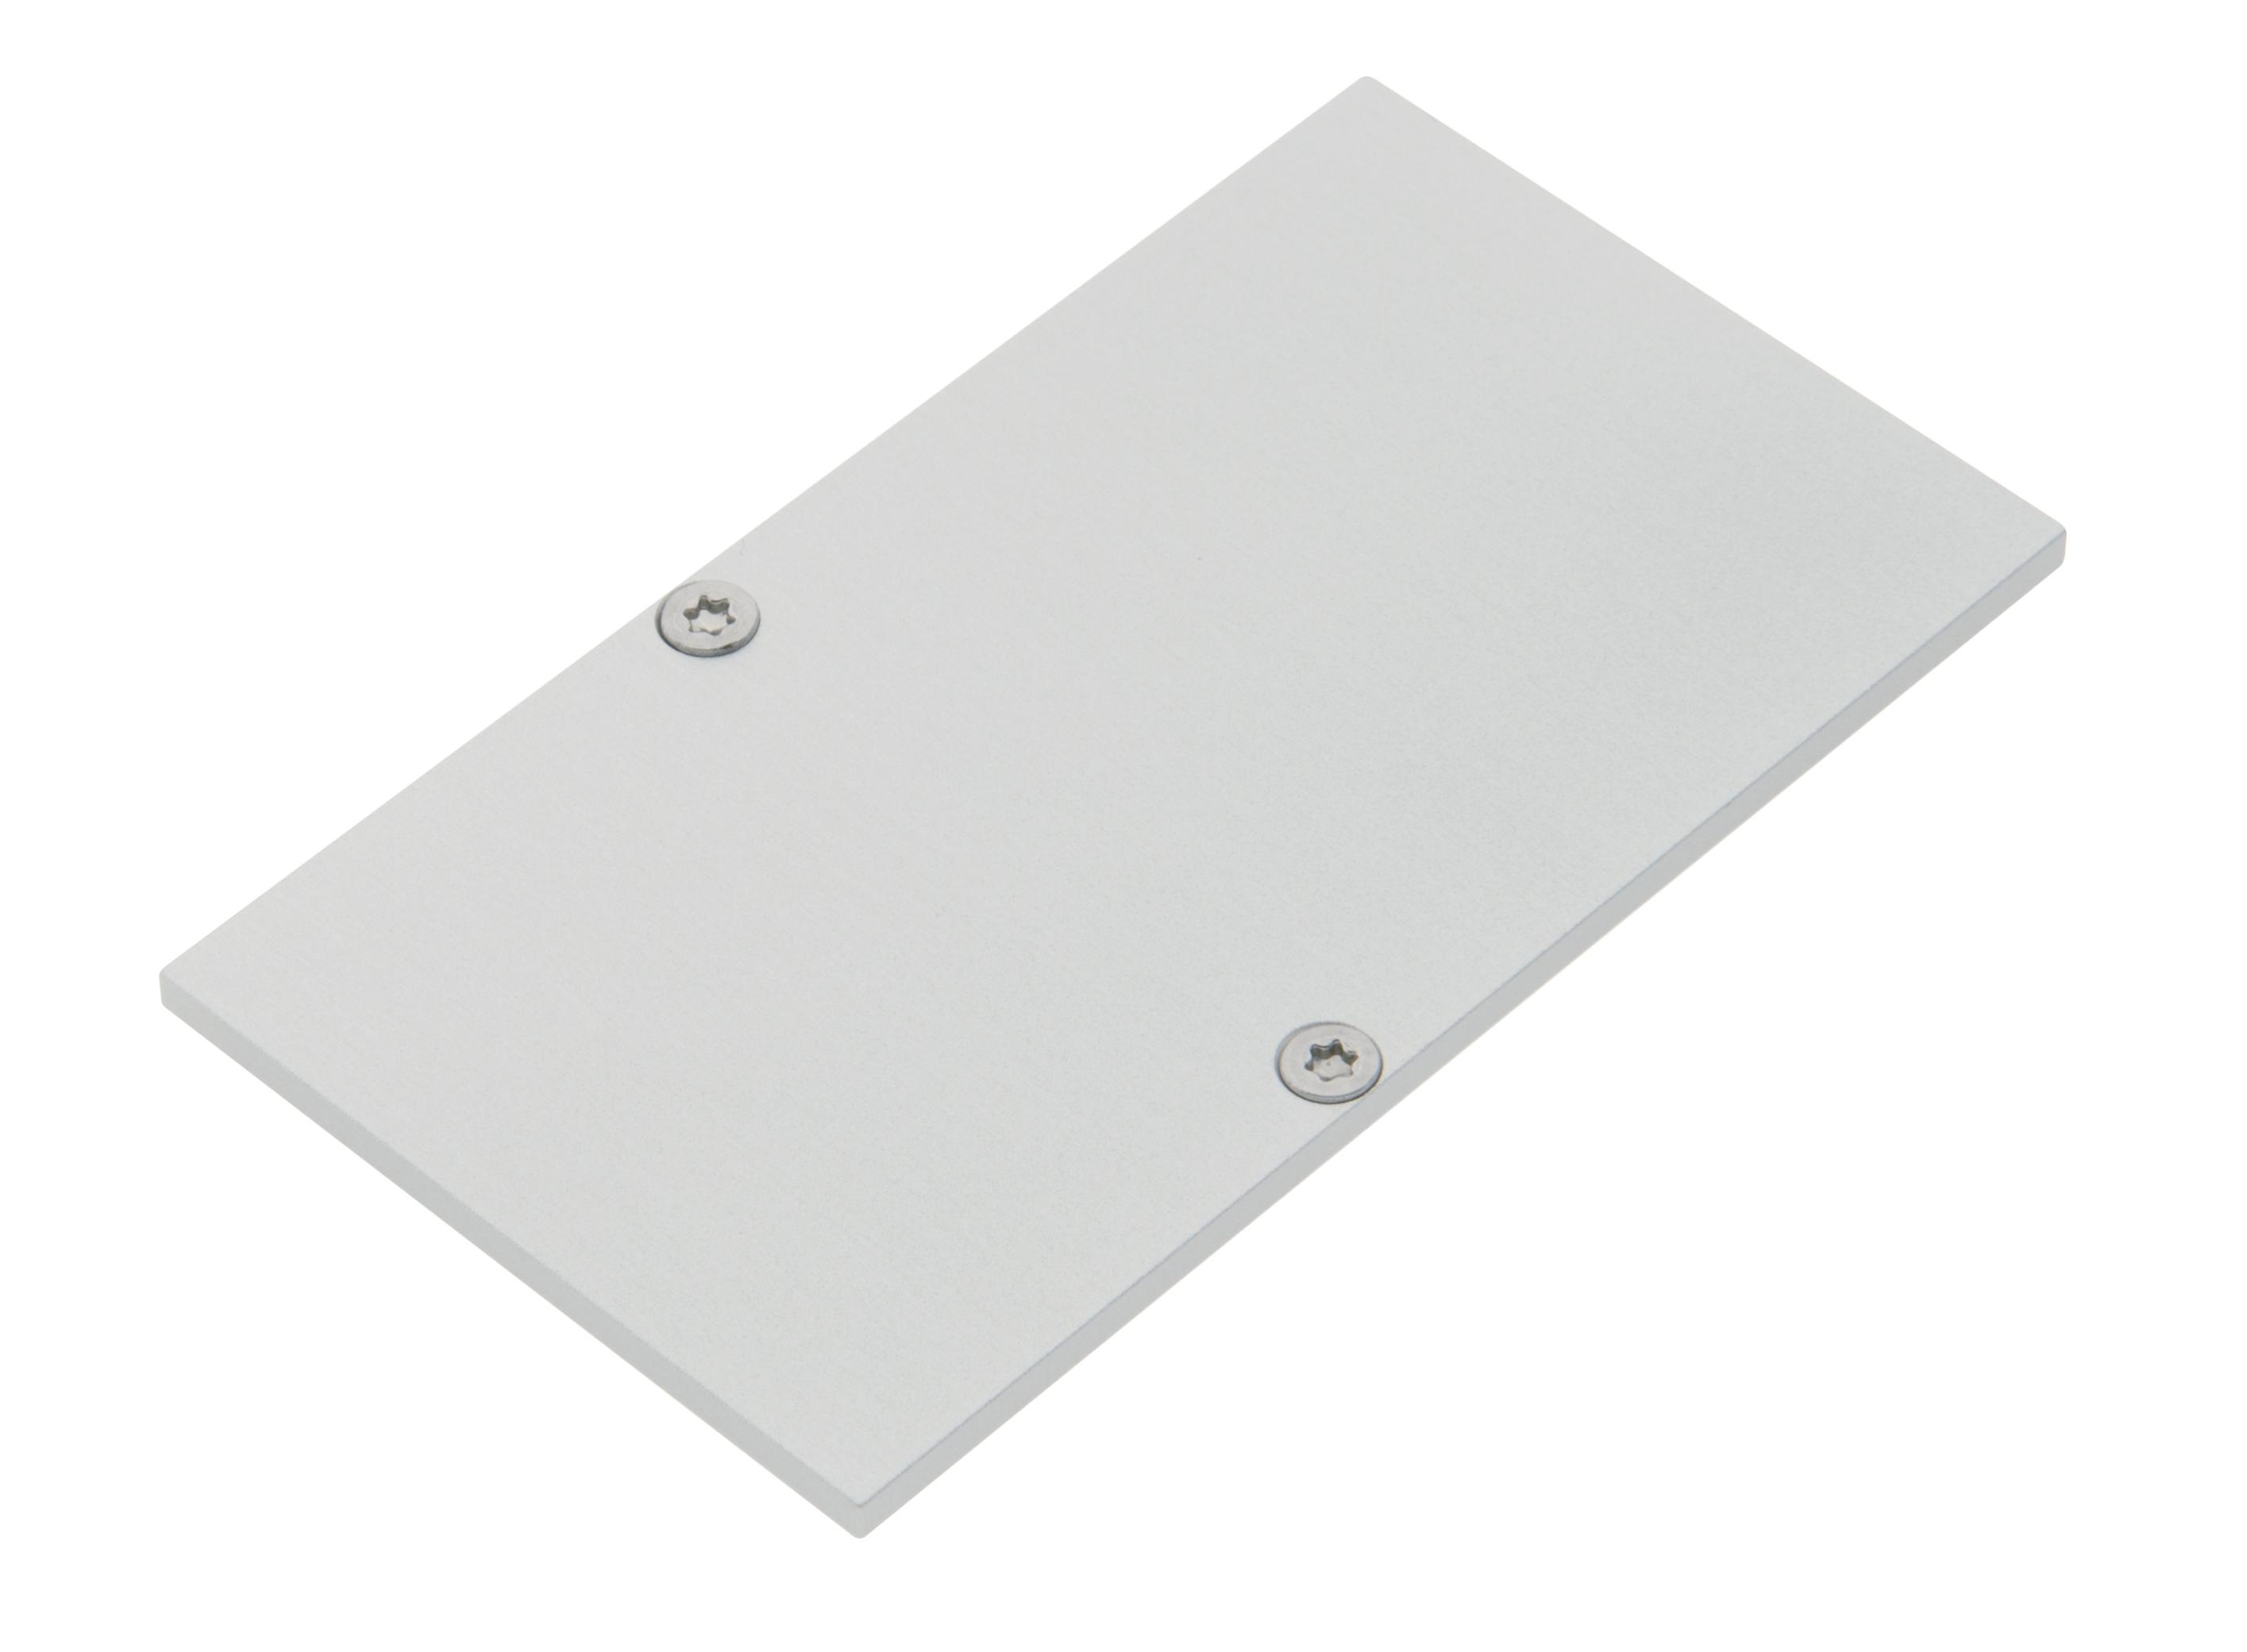 1 Stk Profil Endkappe MFH Eckig geschlossen inkl. Schrauben LIEK005220